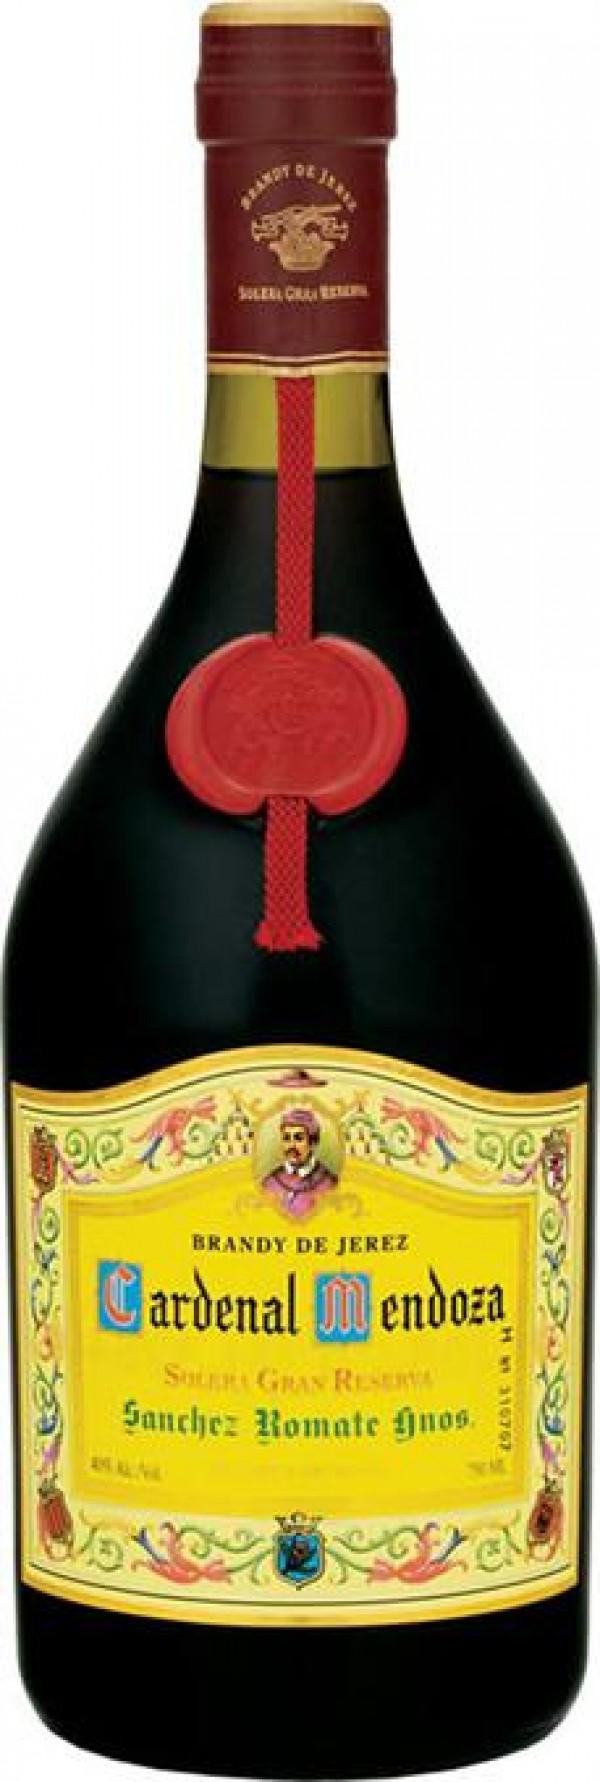 Cardenal Mendoza Brandy de Jerez Clasico